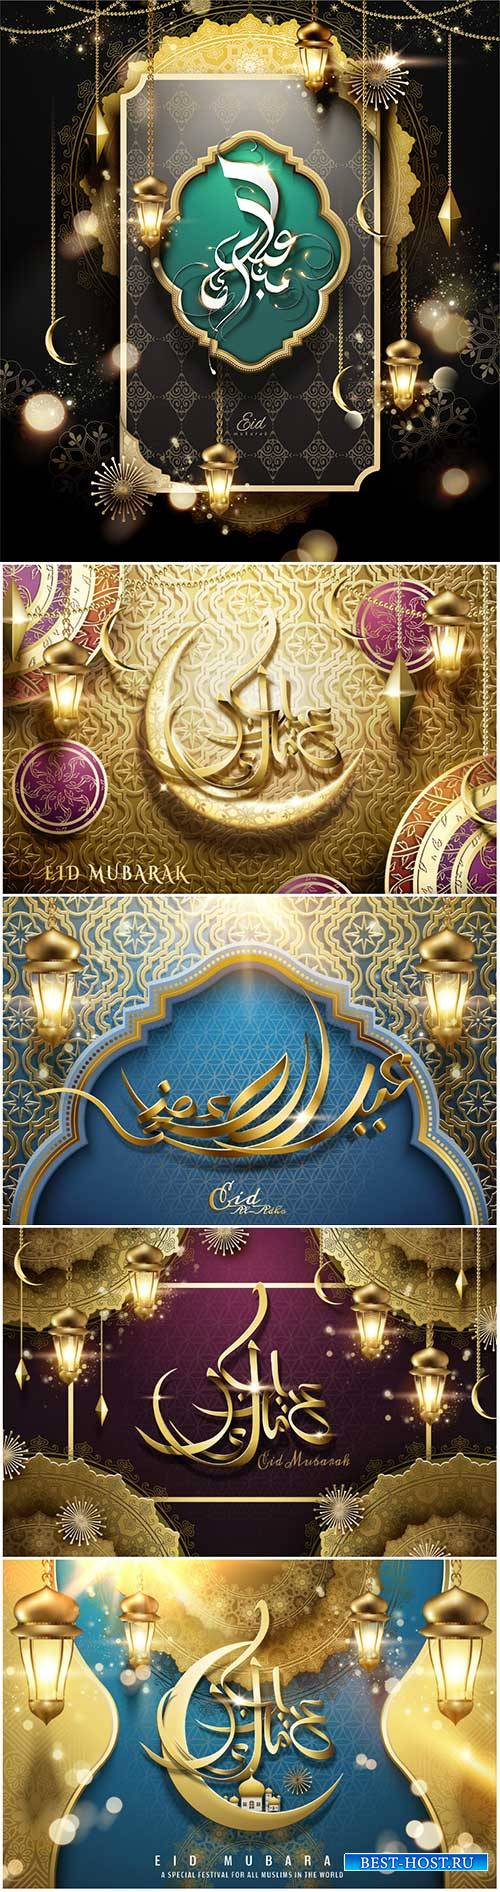 Eid Mubarak calligraphy vector design